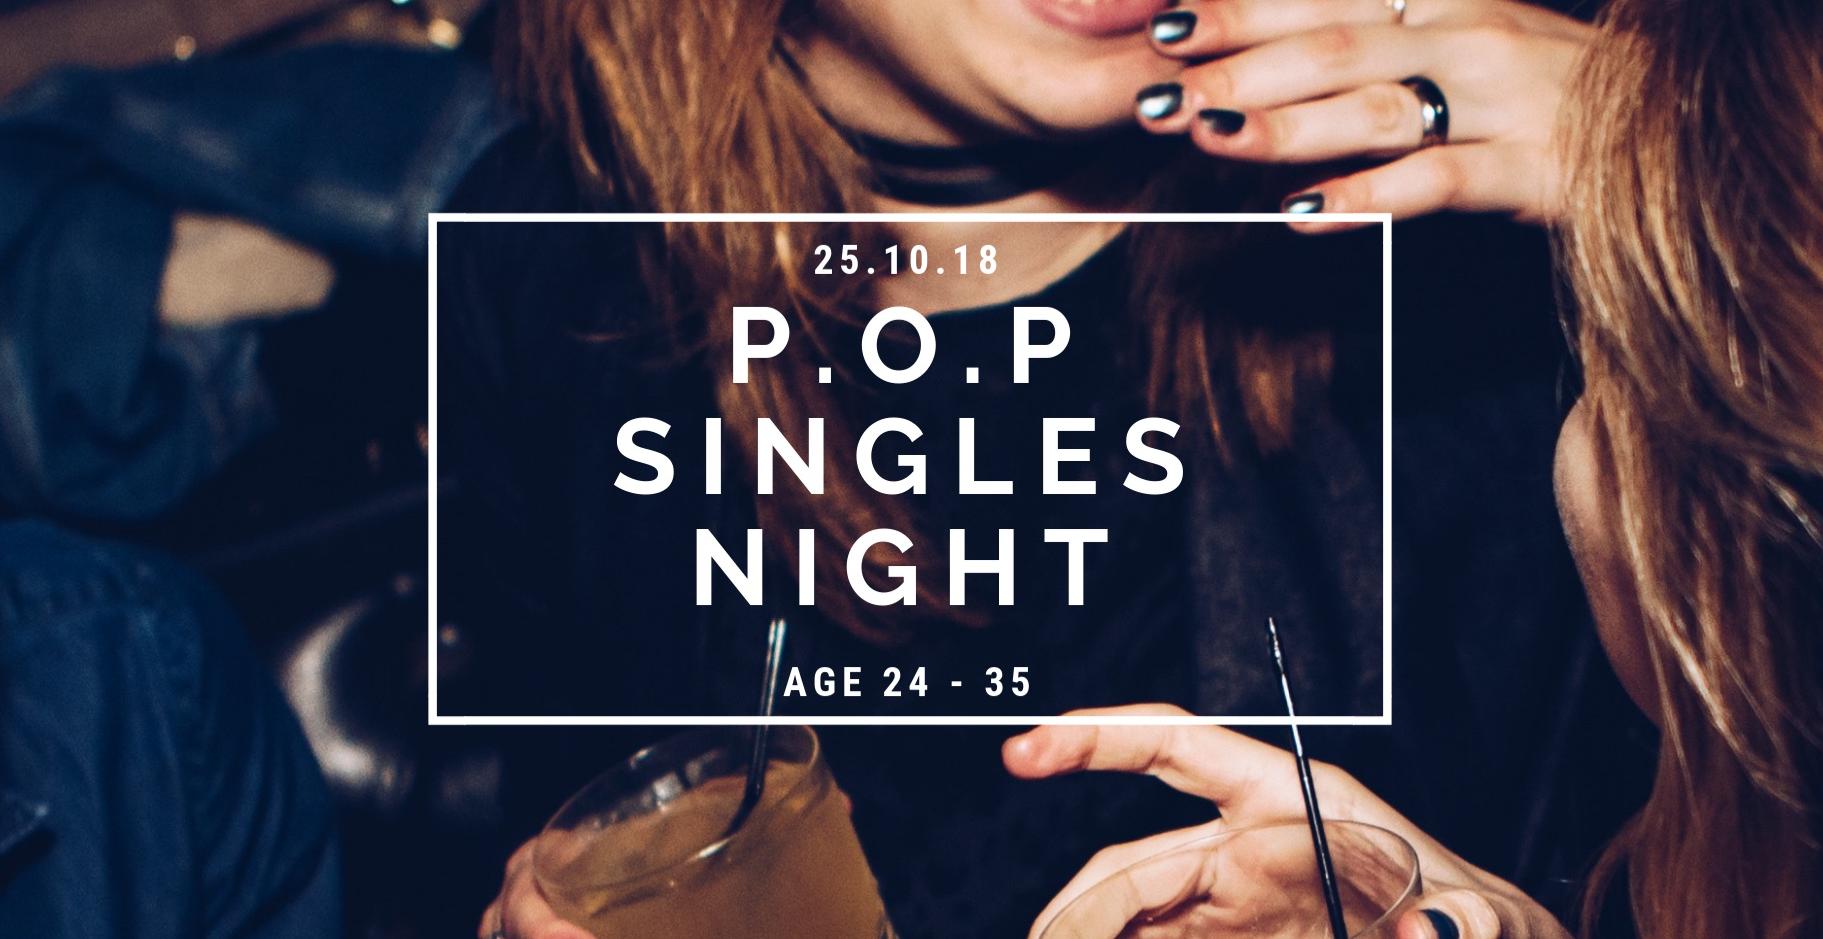 Single dating nights leeds